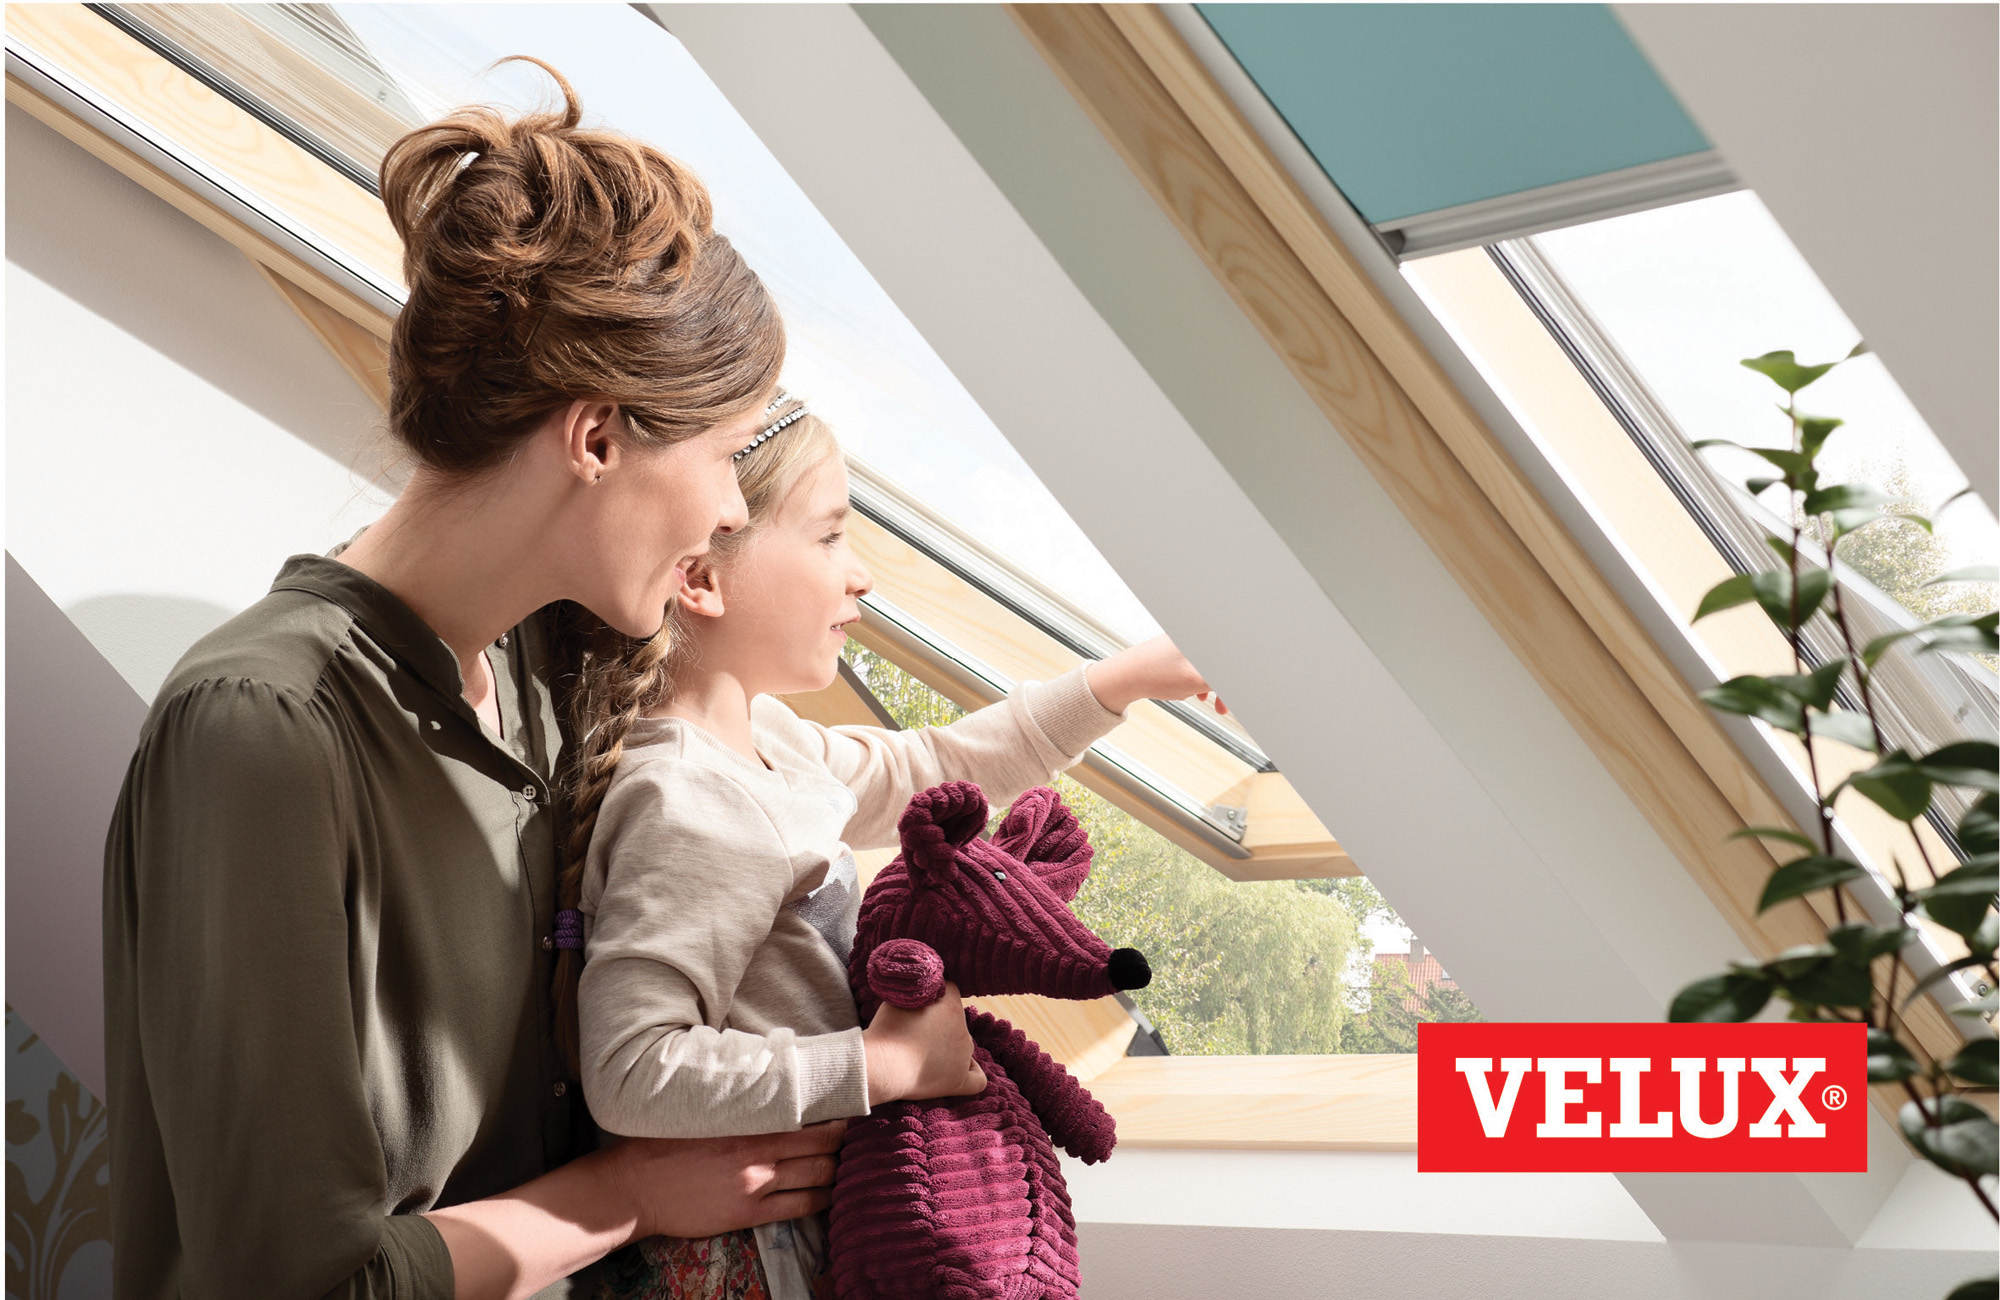 Noua generatie de ferestre de mansarda VELUX - Noua generatie de ferestre de mansarda VELUX